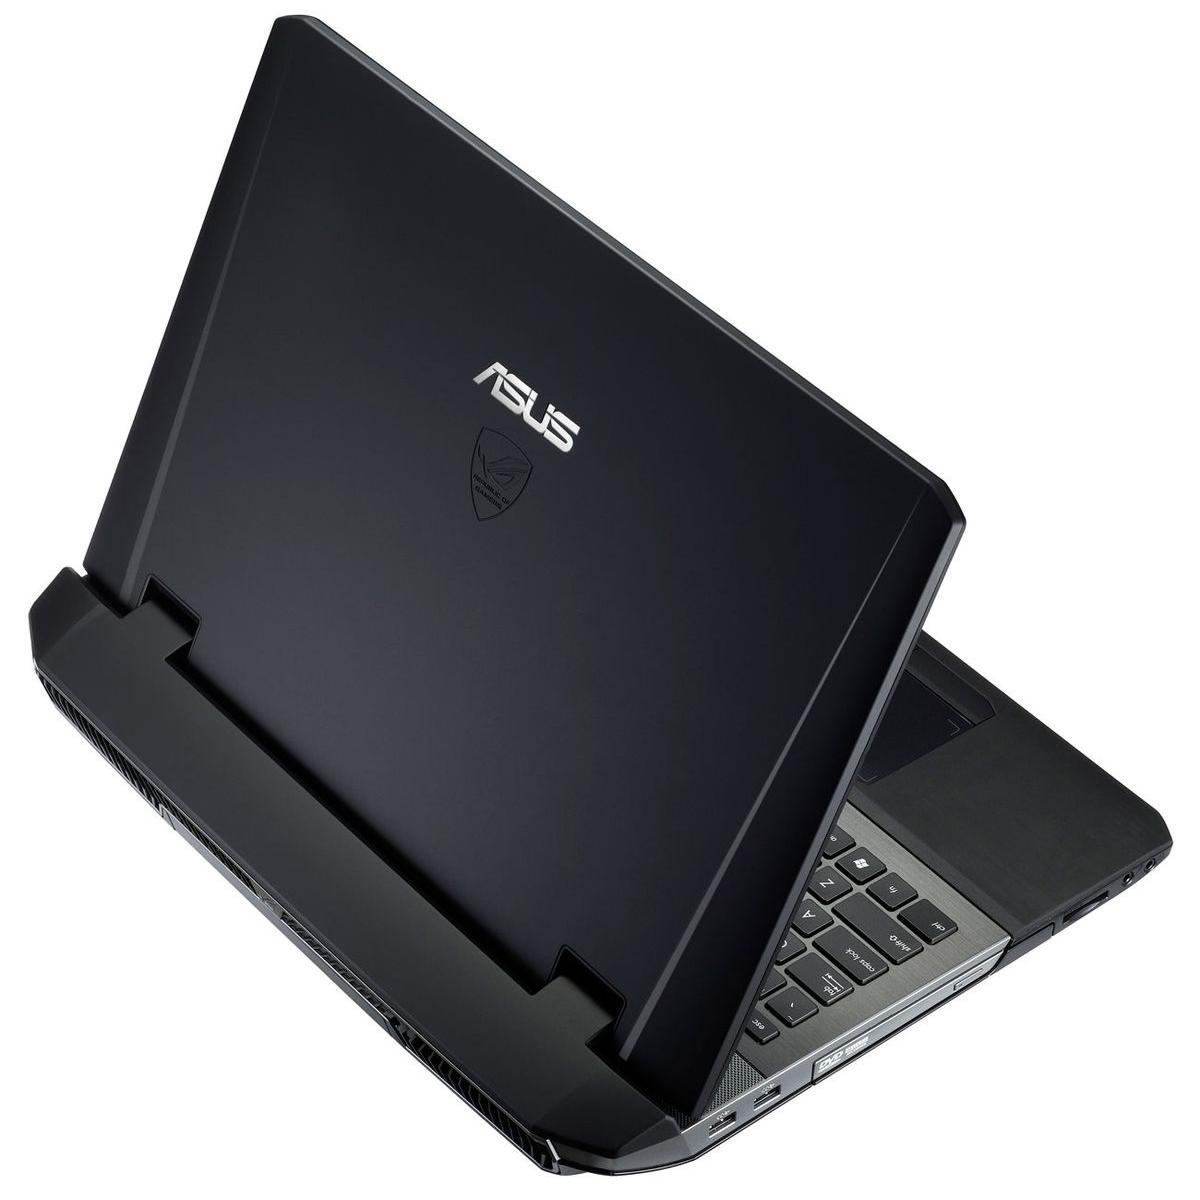 "Asus G75VX-T4034H 17,3""  Core i7-3630QM (2.4 GHz) GHz  - HDD  - RAM 16 Go"